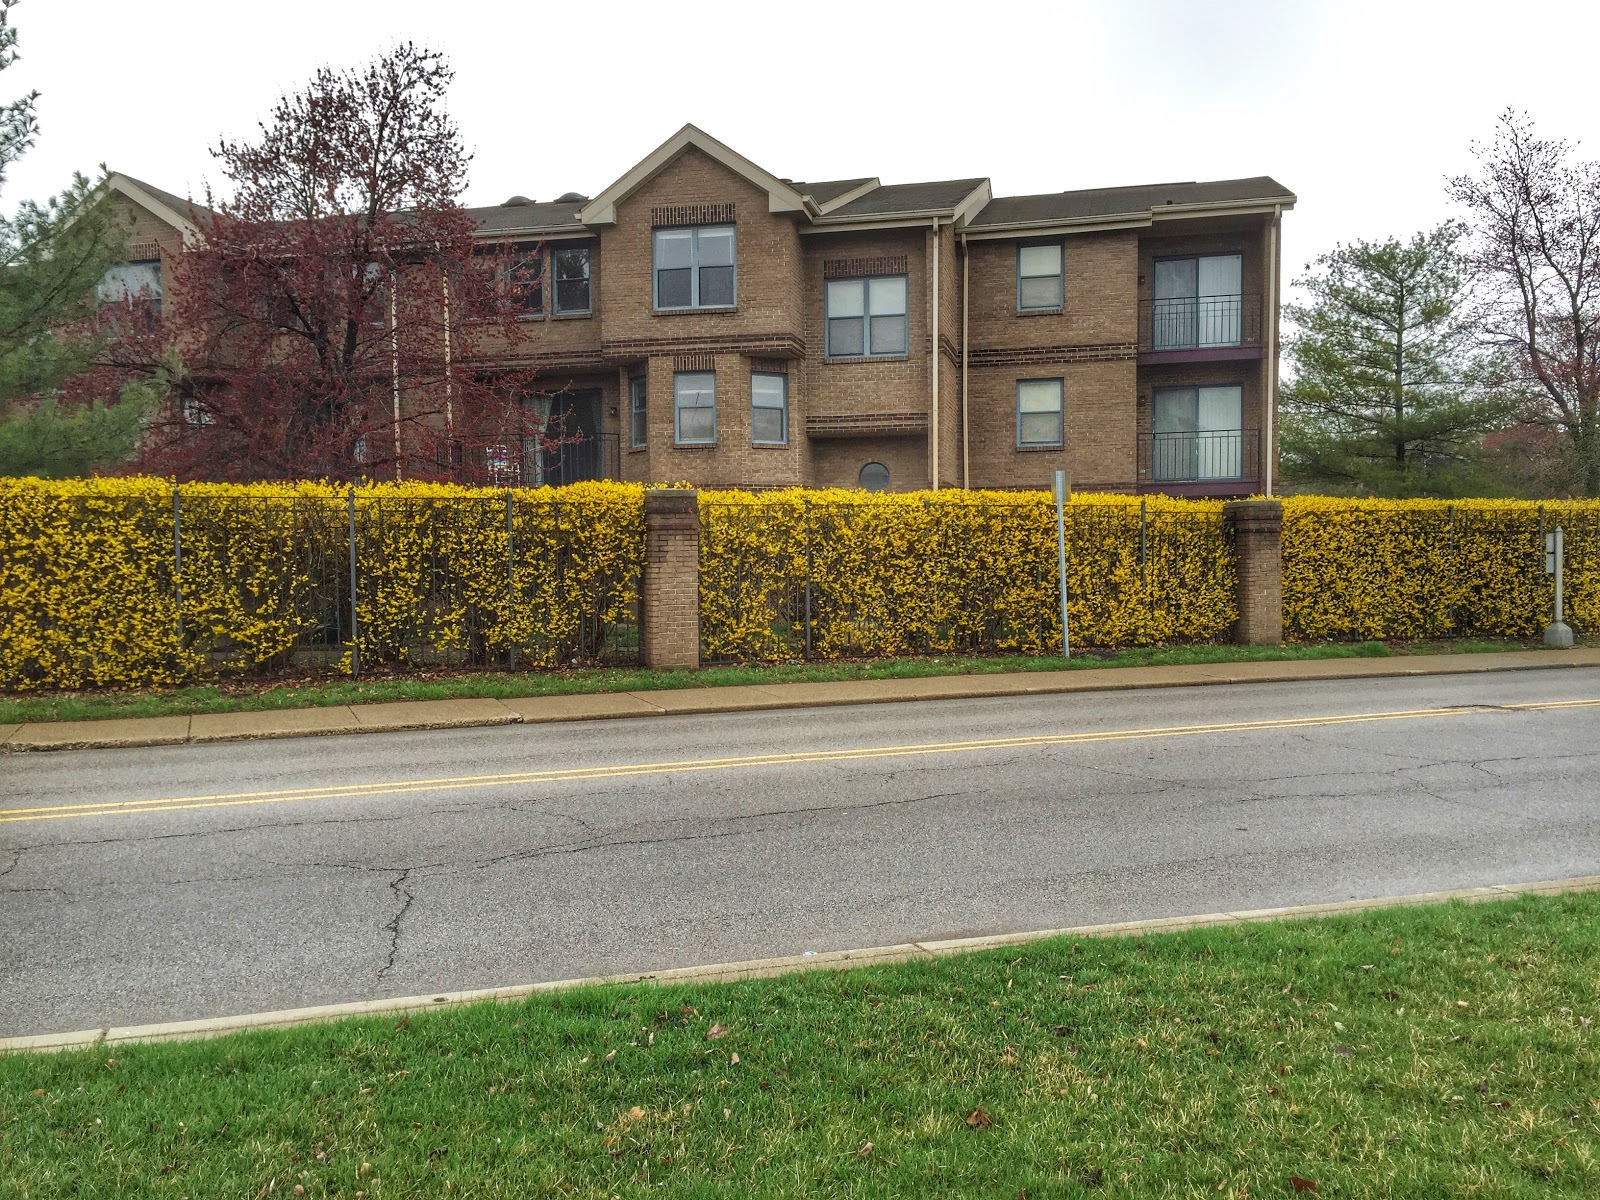 Forsythia x intermedia yellow flower hedge